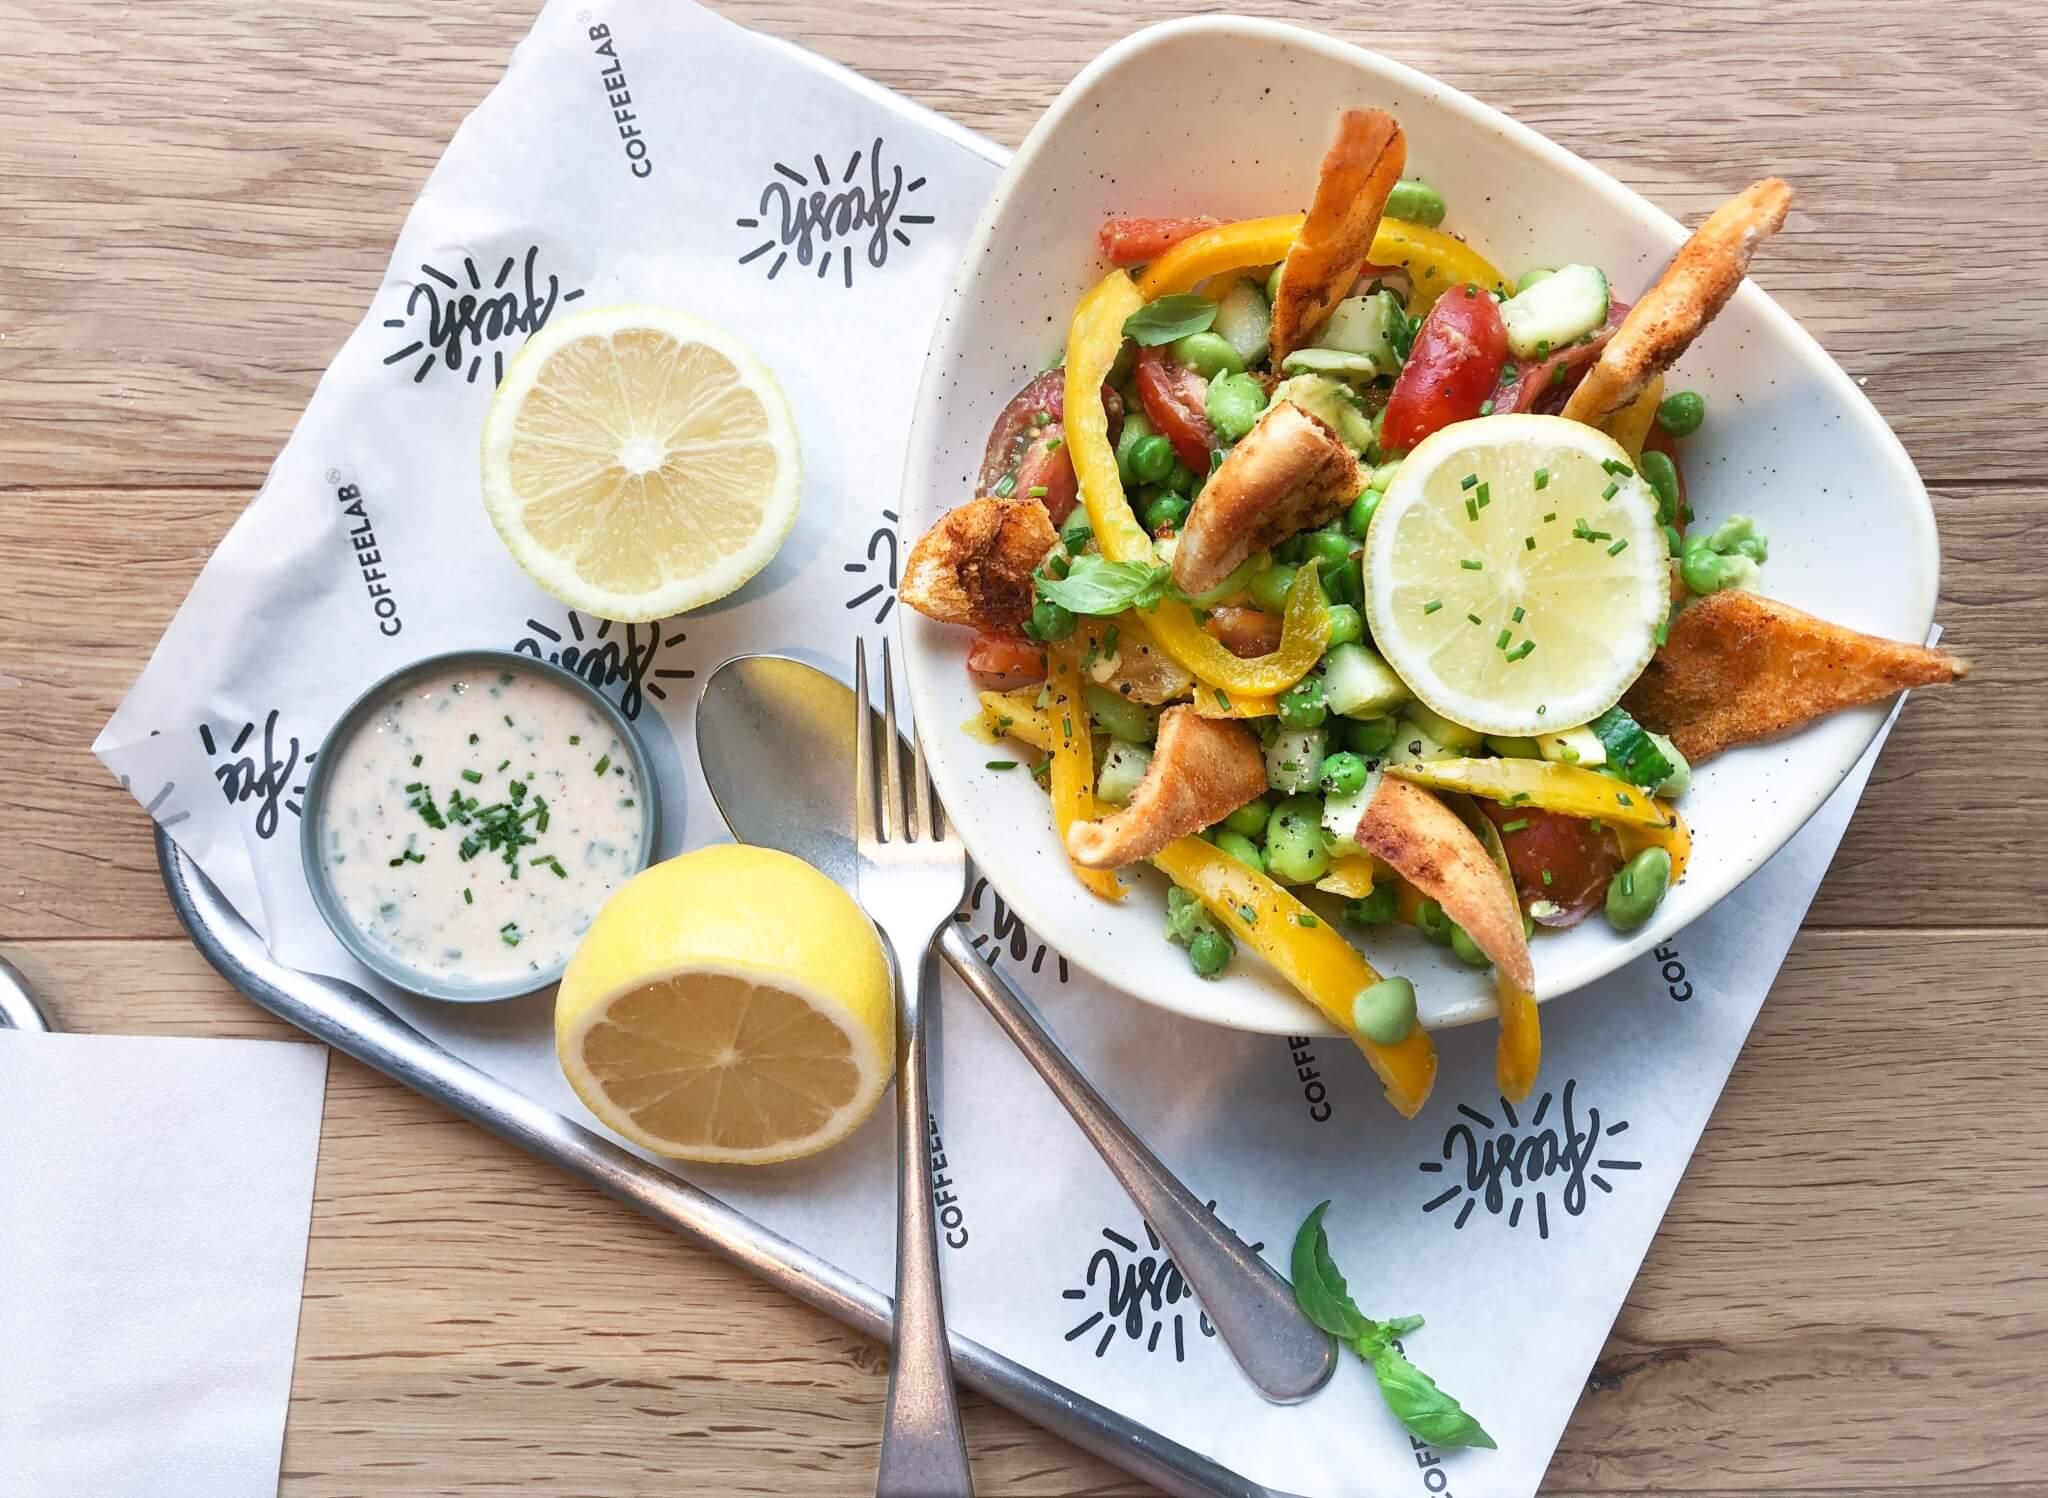 Salade The Lemon Kitchen proef je bij Coffeelab Den Bosch